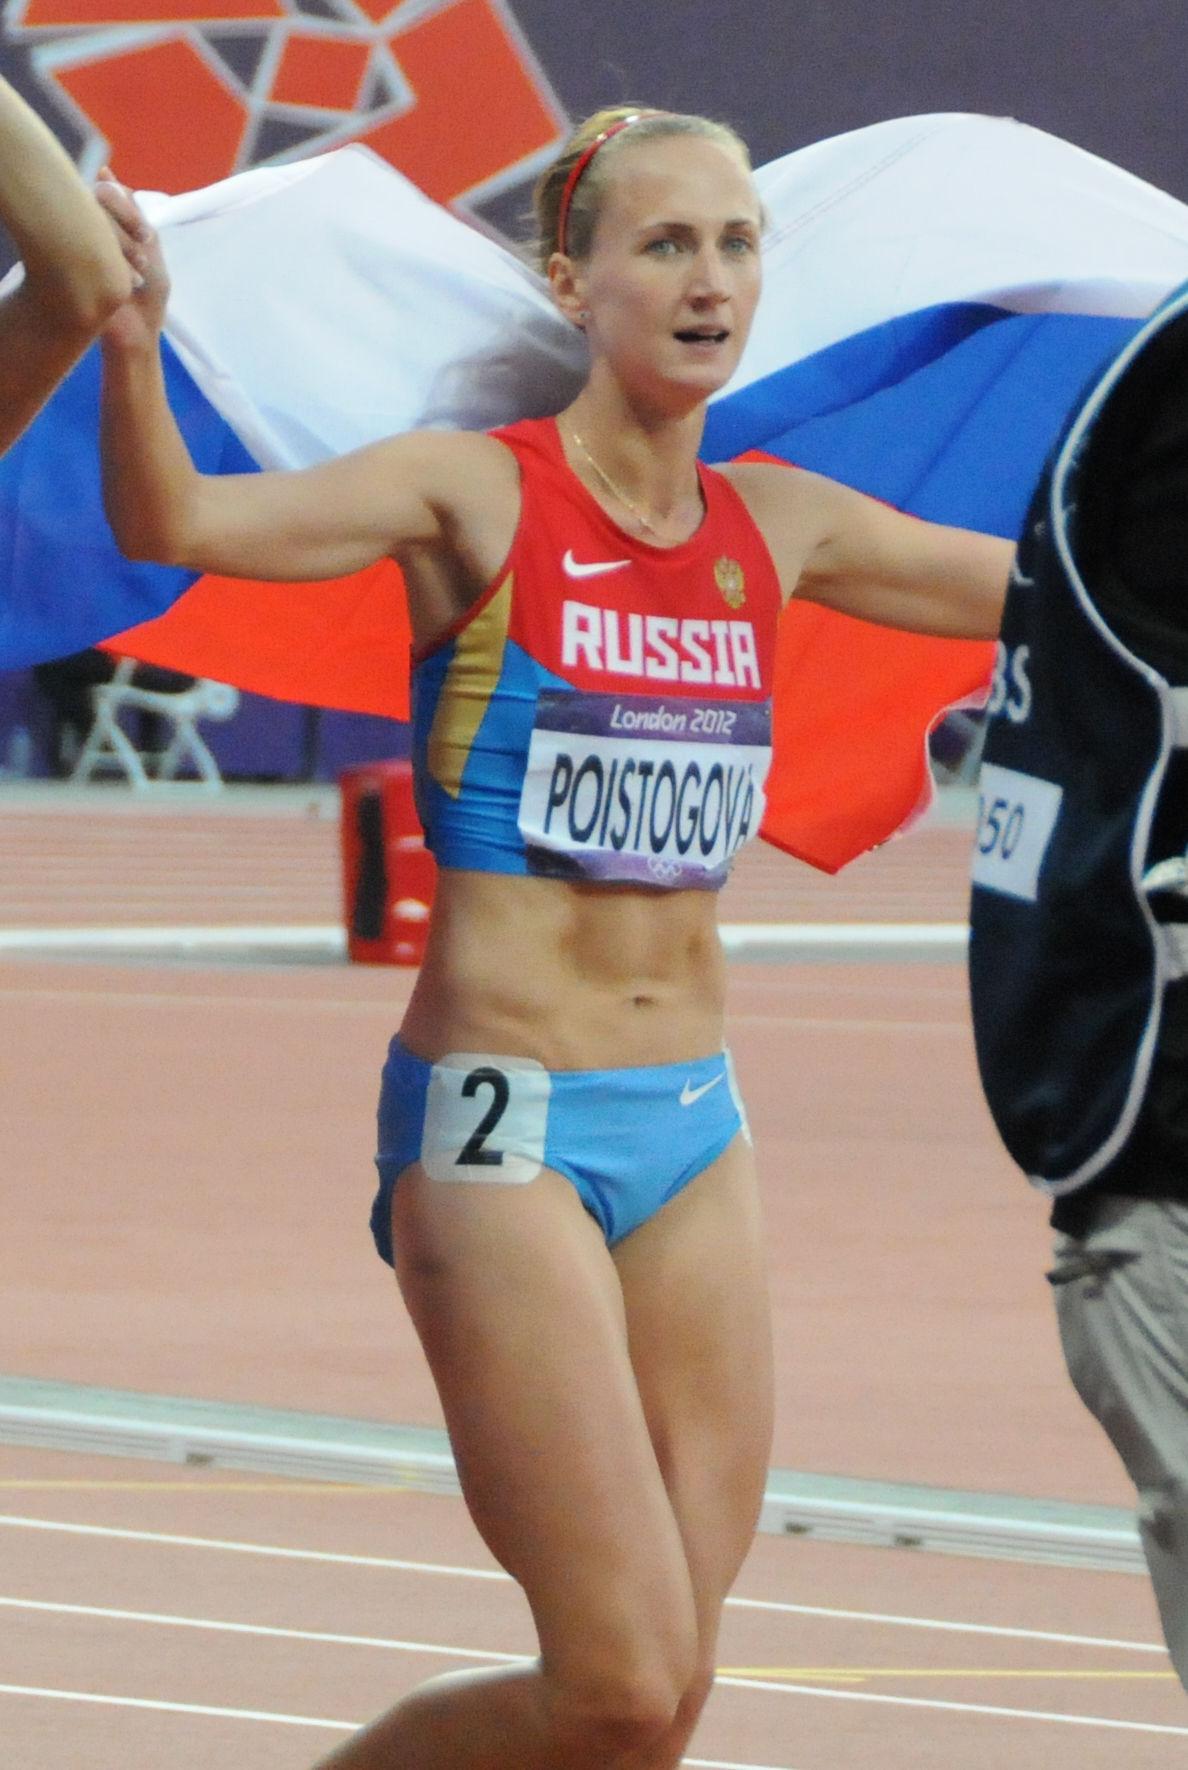 Photo of Ekaterina Poistogova: Olympic runner